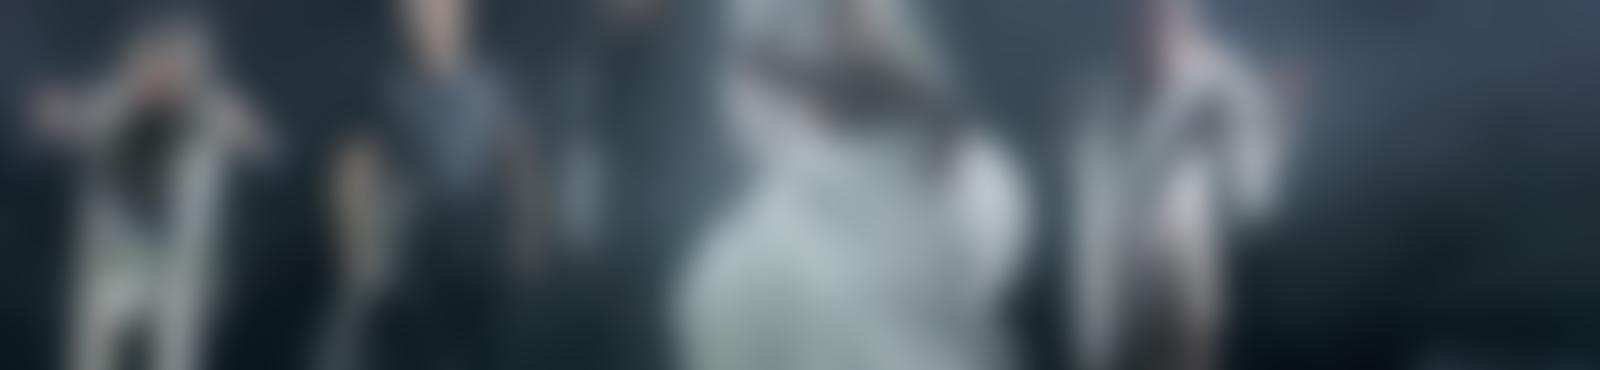 Blurred e18fe325 e50d 4206 8d86 8e778748ce03